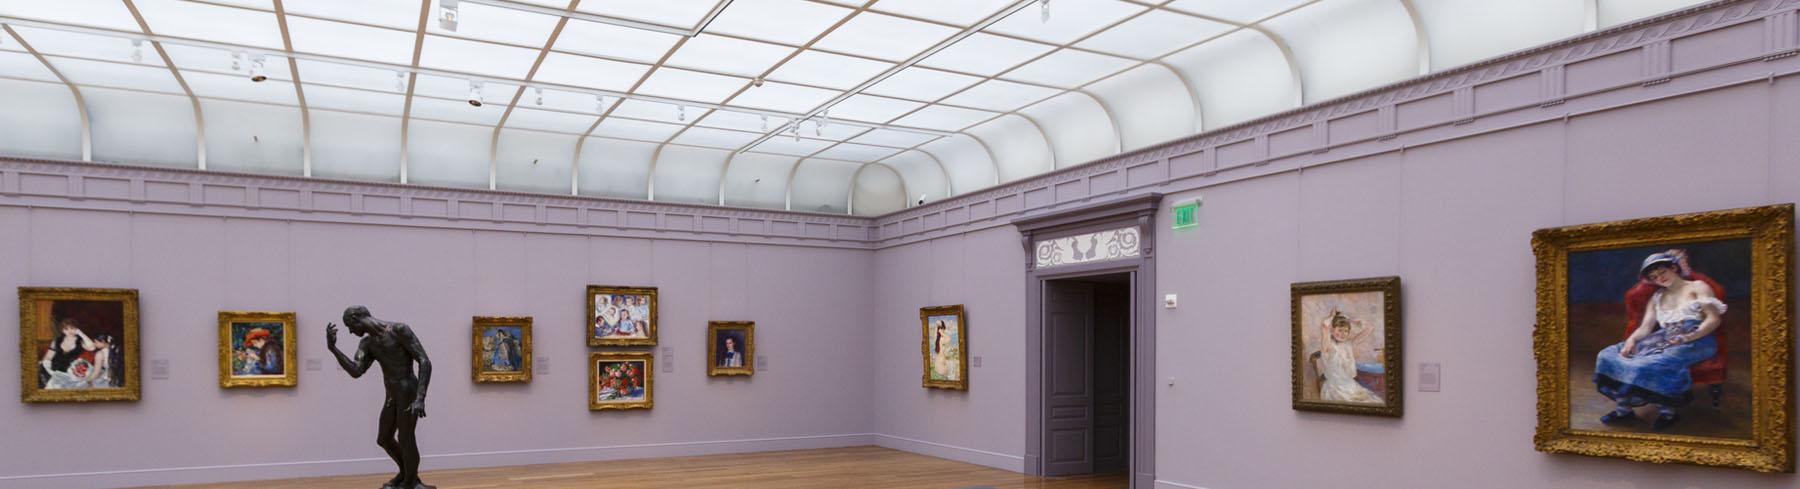 Gallery in The Clark